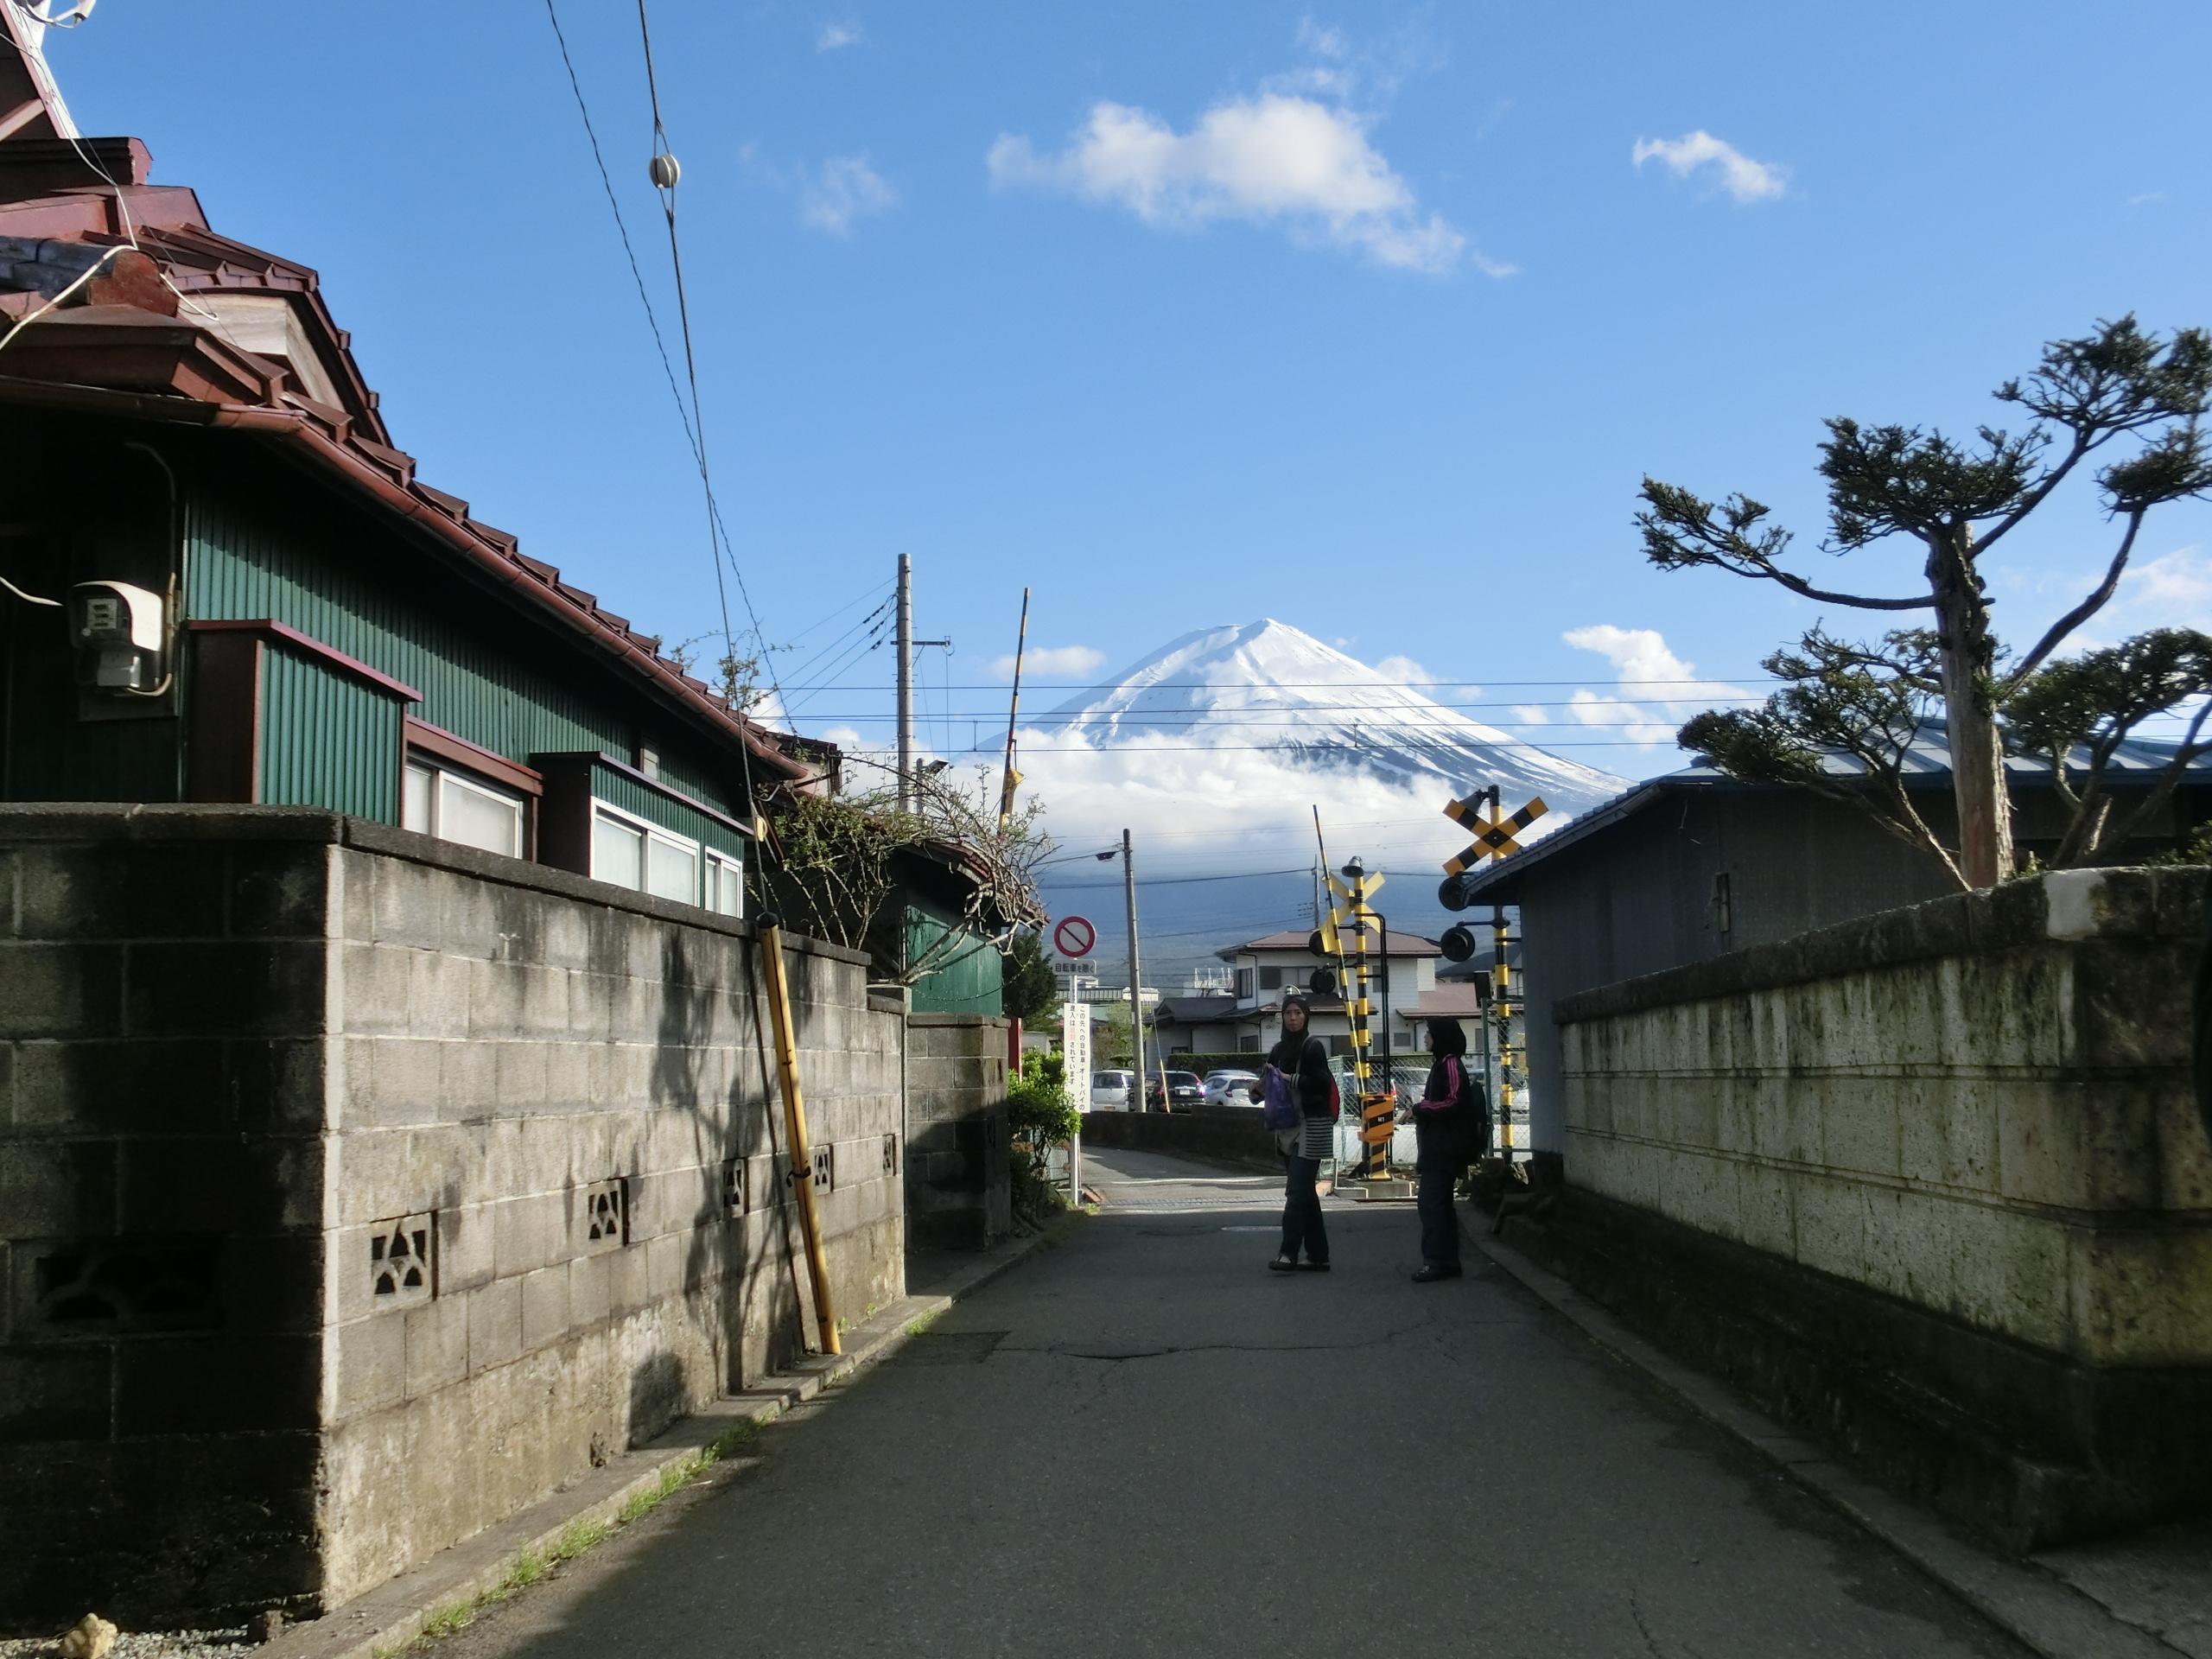 Mt. Fuji Photos by JAPAN Forward Readers 2018 Season